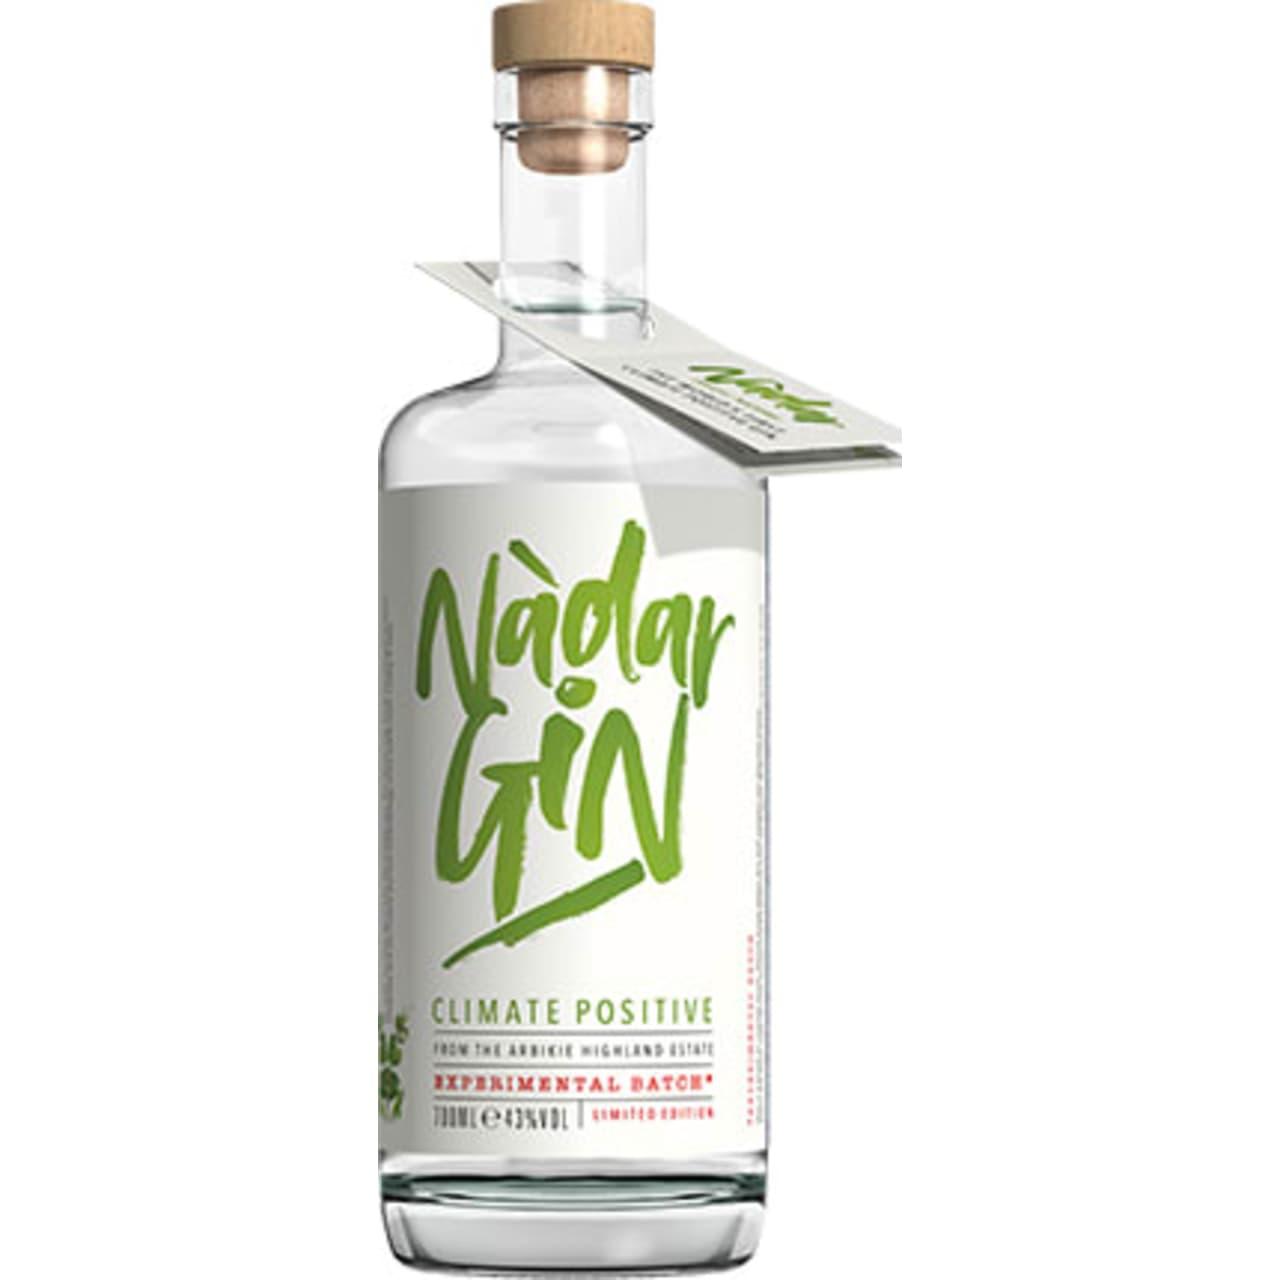 Product Image - Arbikie's Nadar Gin